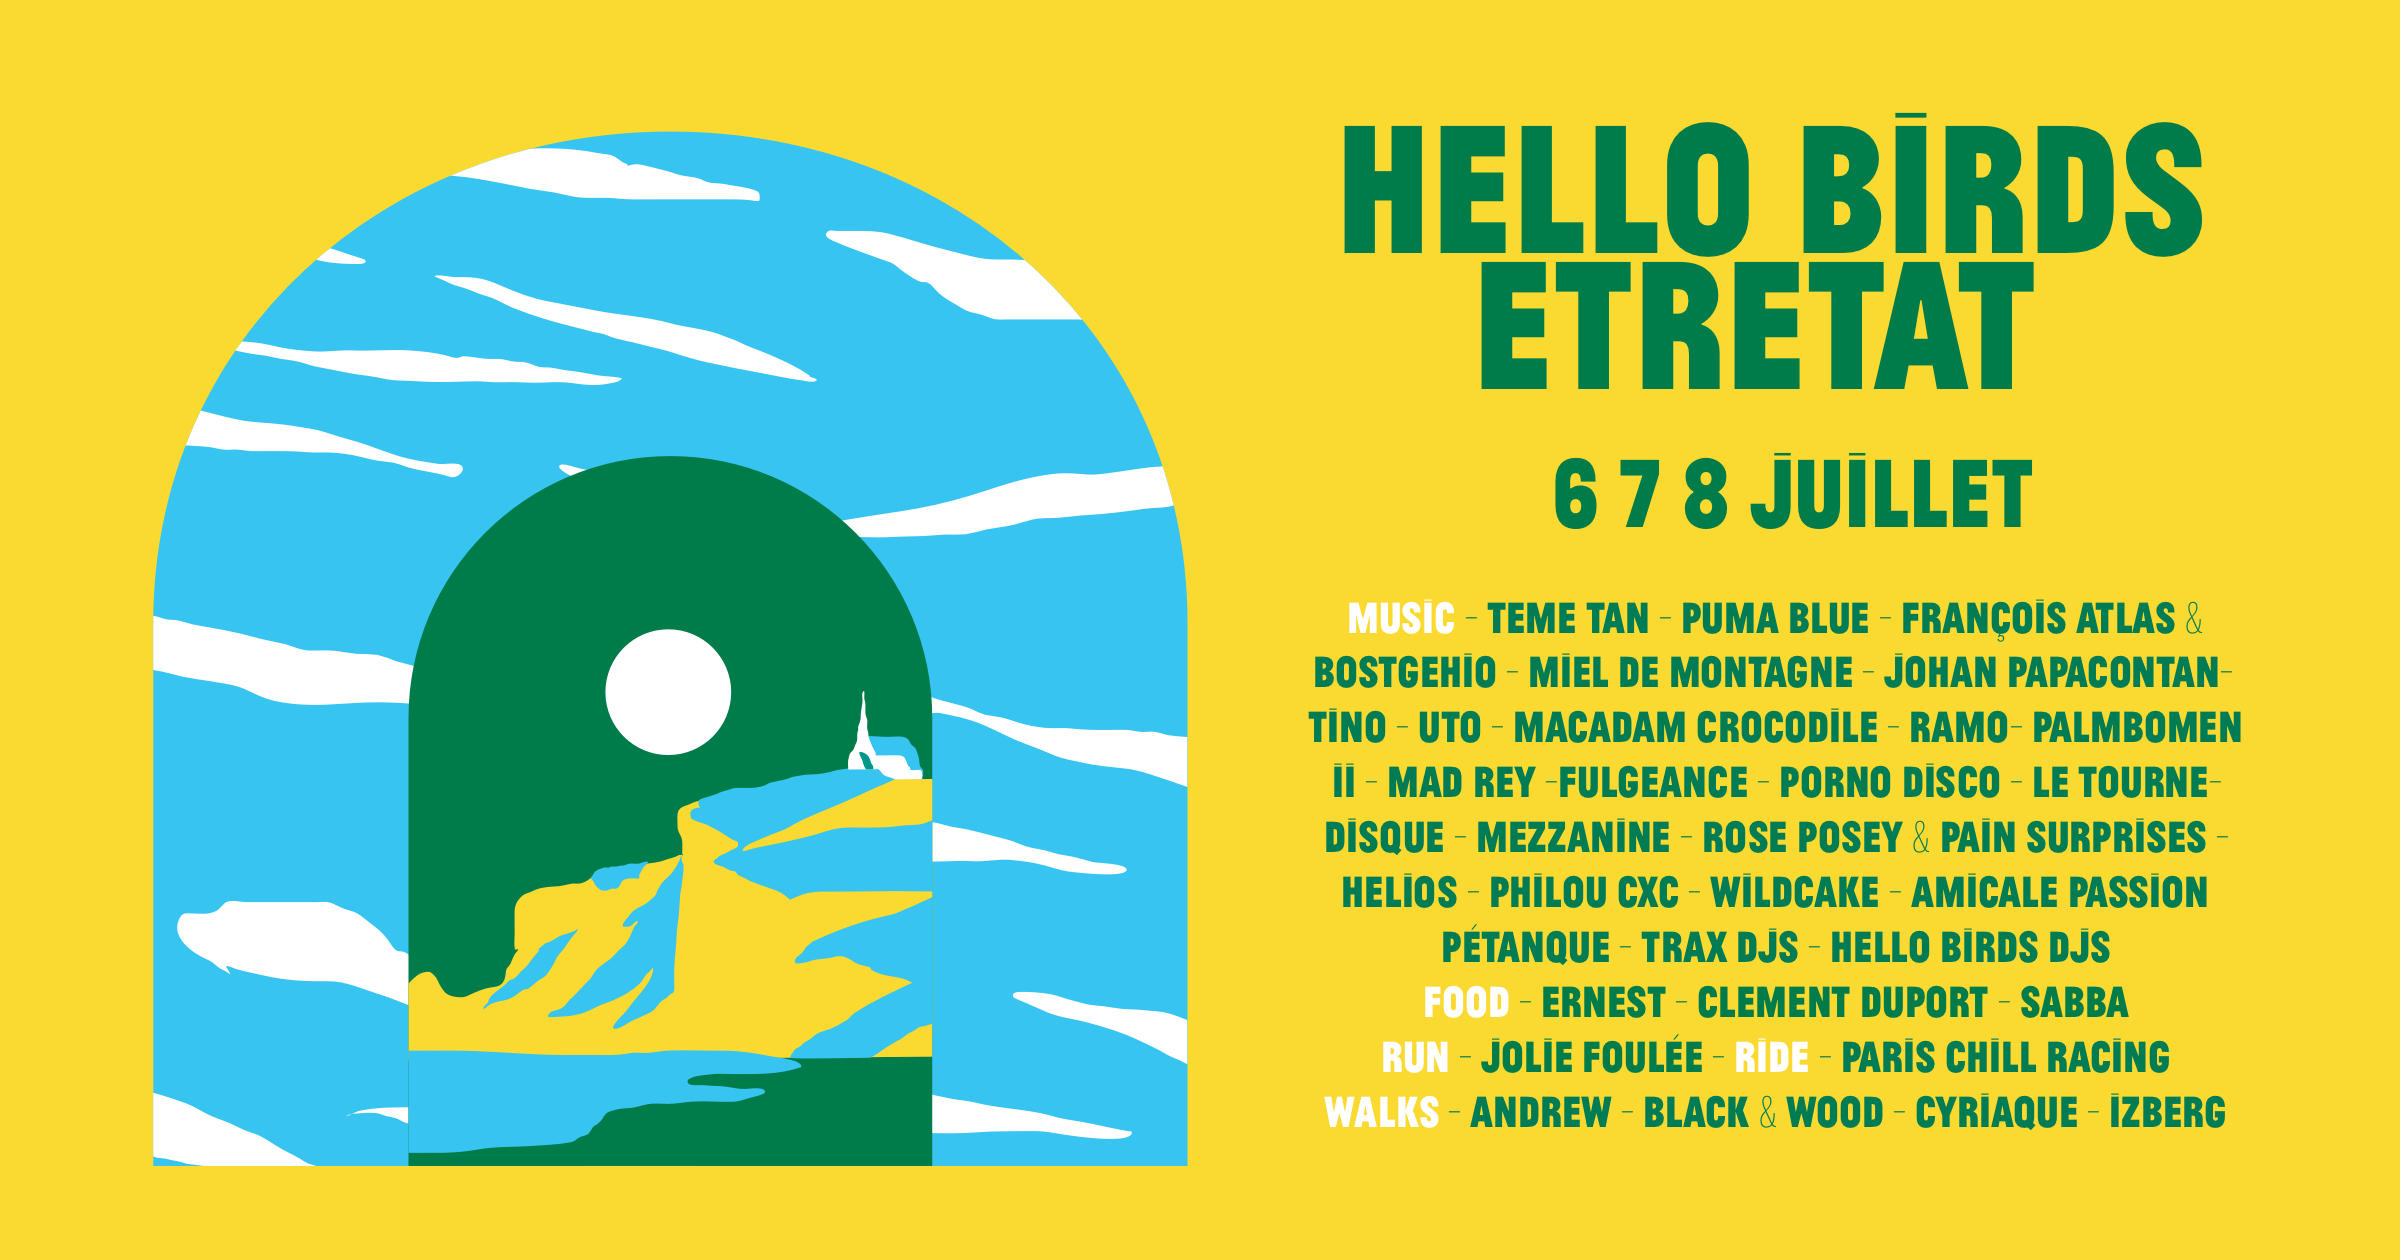 Hello Birds Festival Etretat